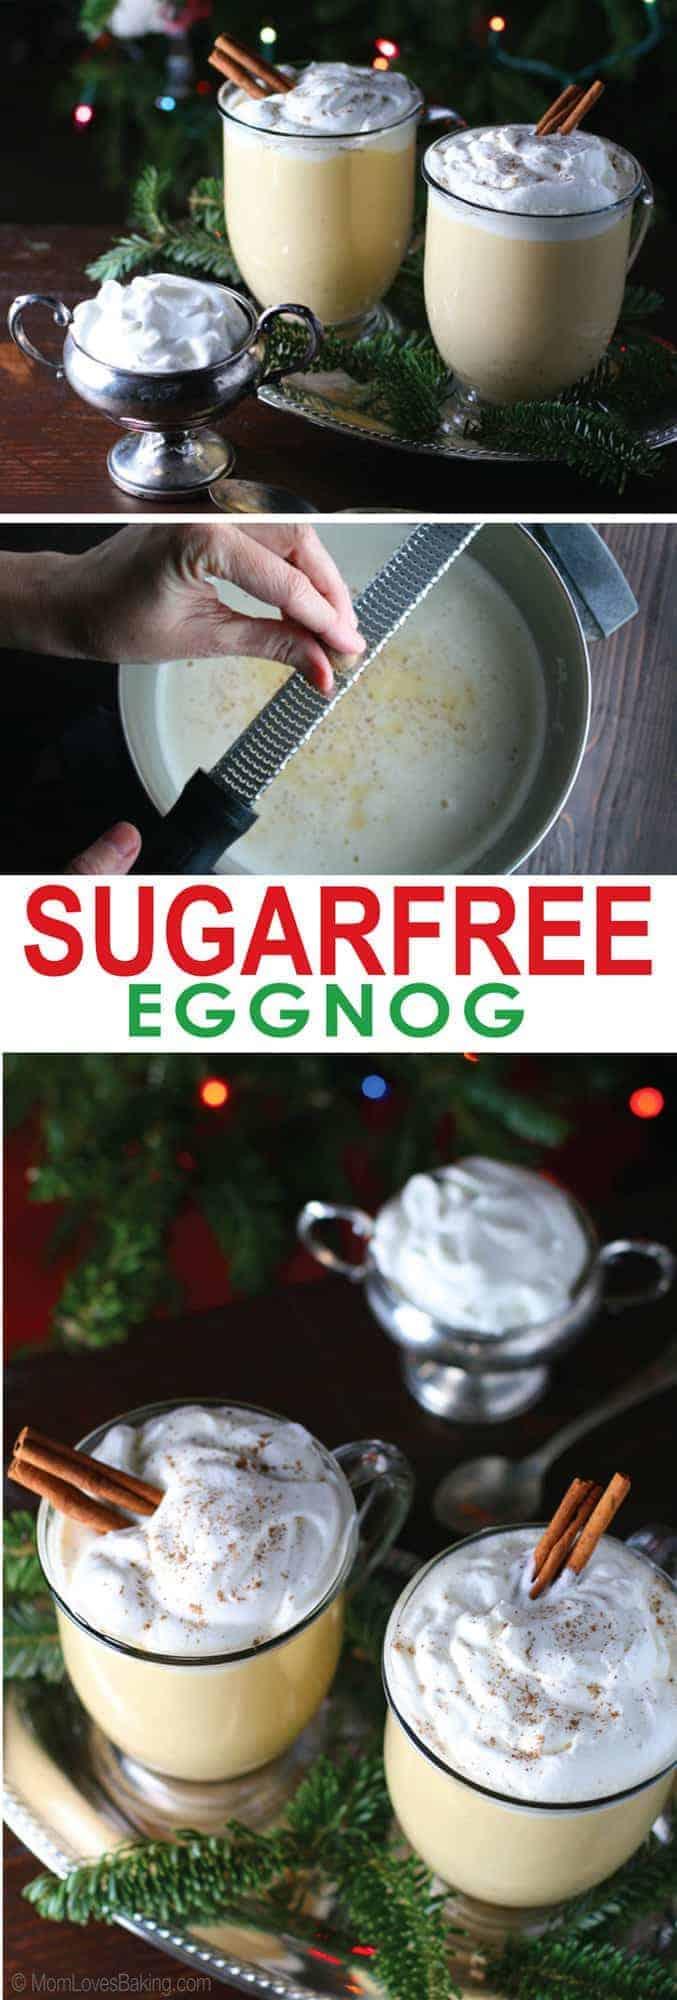 Sugarfree Eggnog